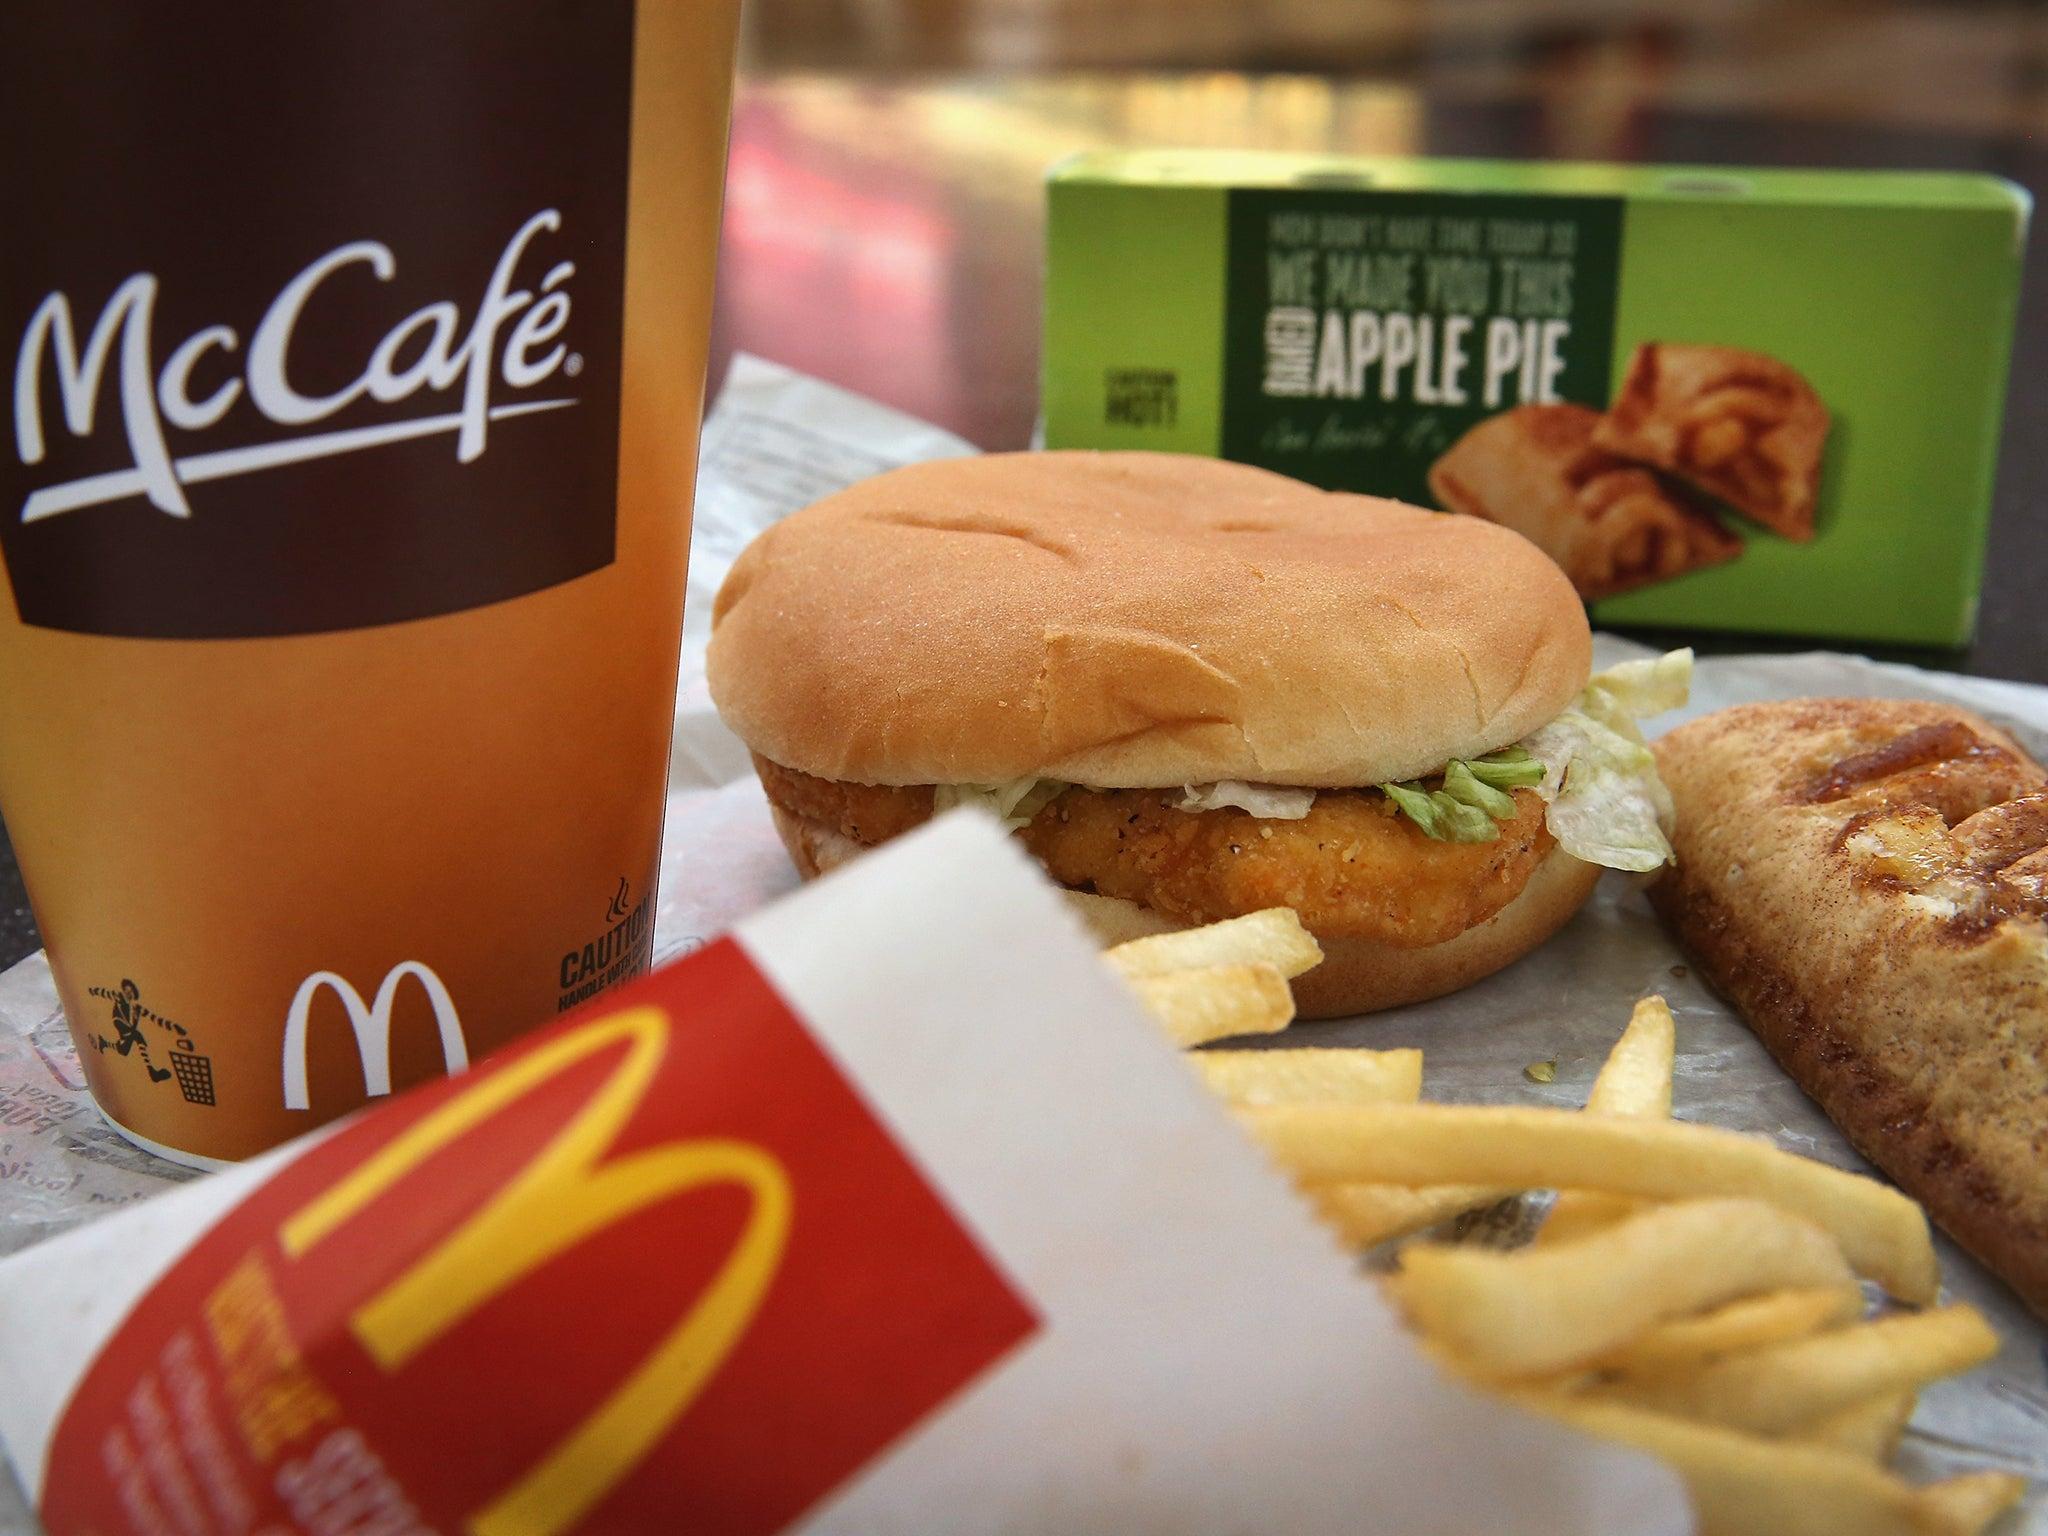 Fashion food: Макдональдс в стиле лухури картинки